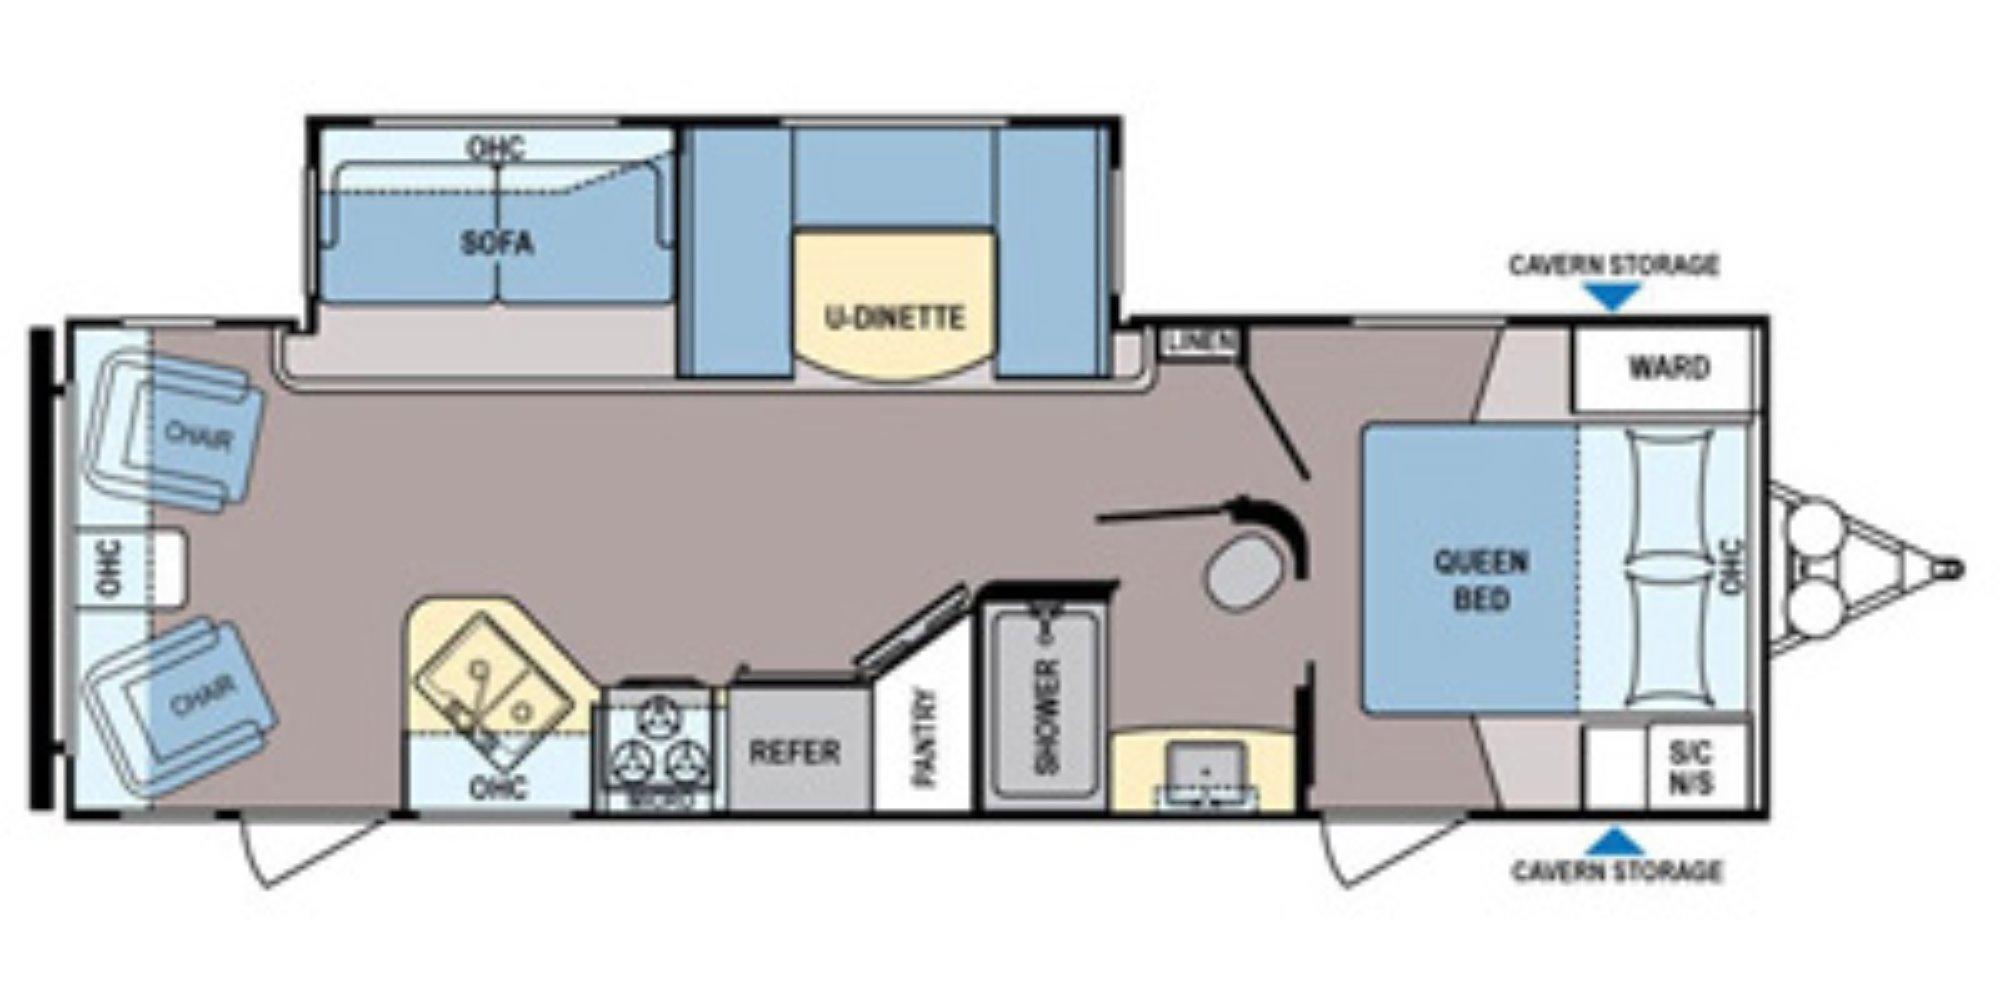 Zinger Travel Trailers Floor Plans Used 2015 Dutchmen Coleman 270rl Travel Trailer For Sale